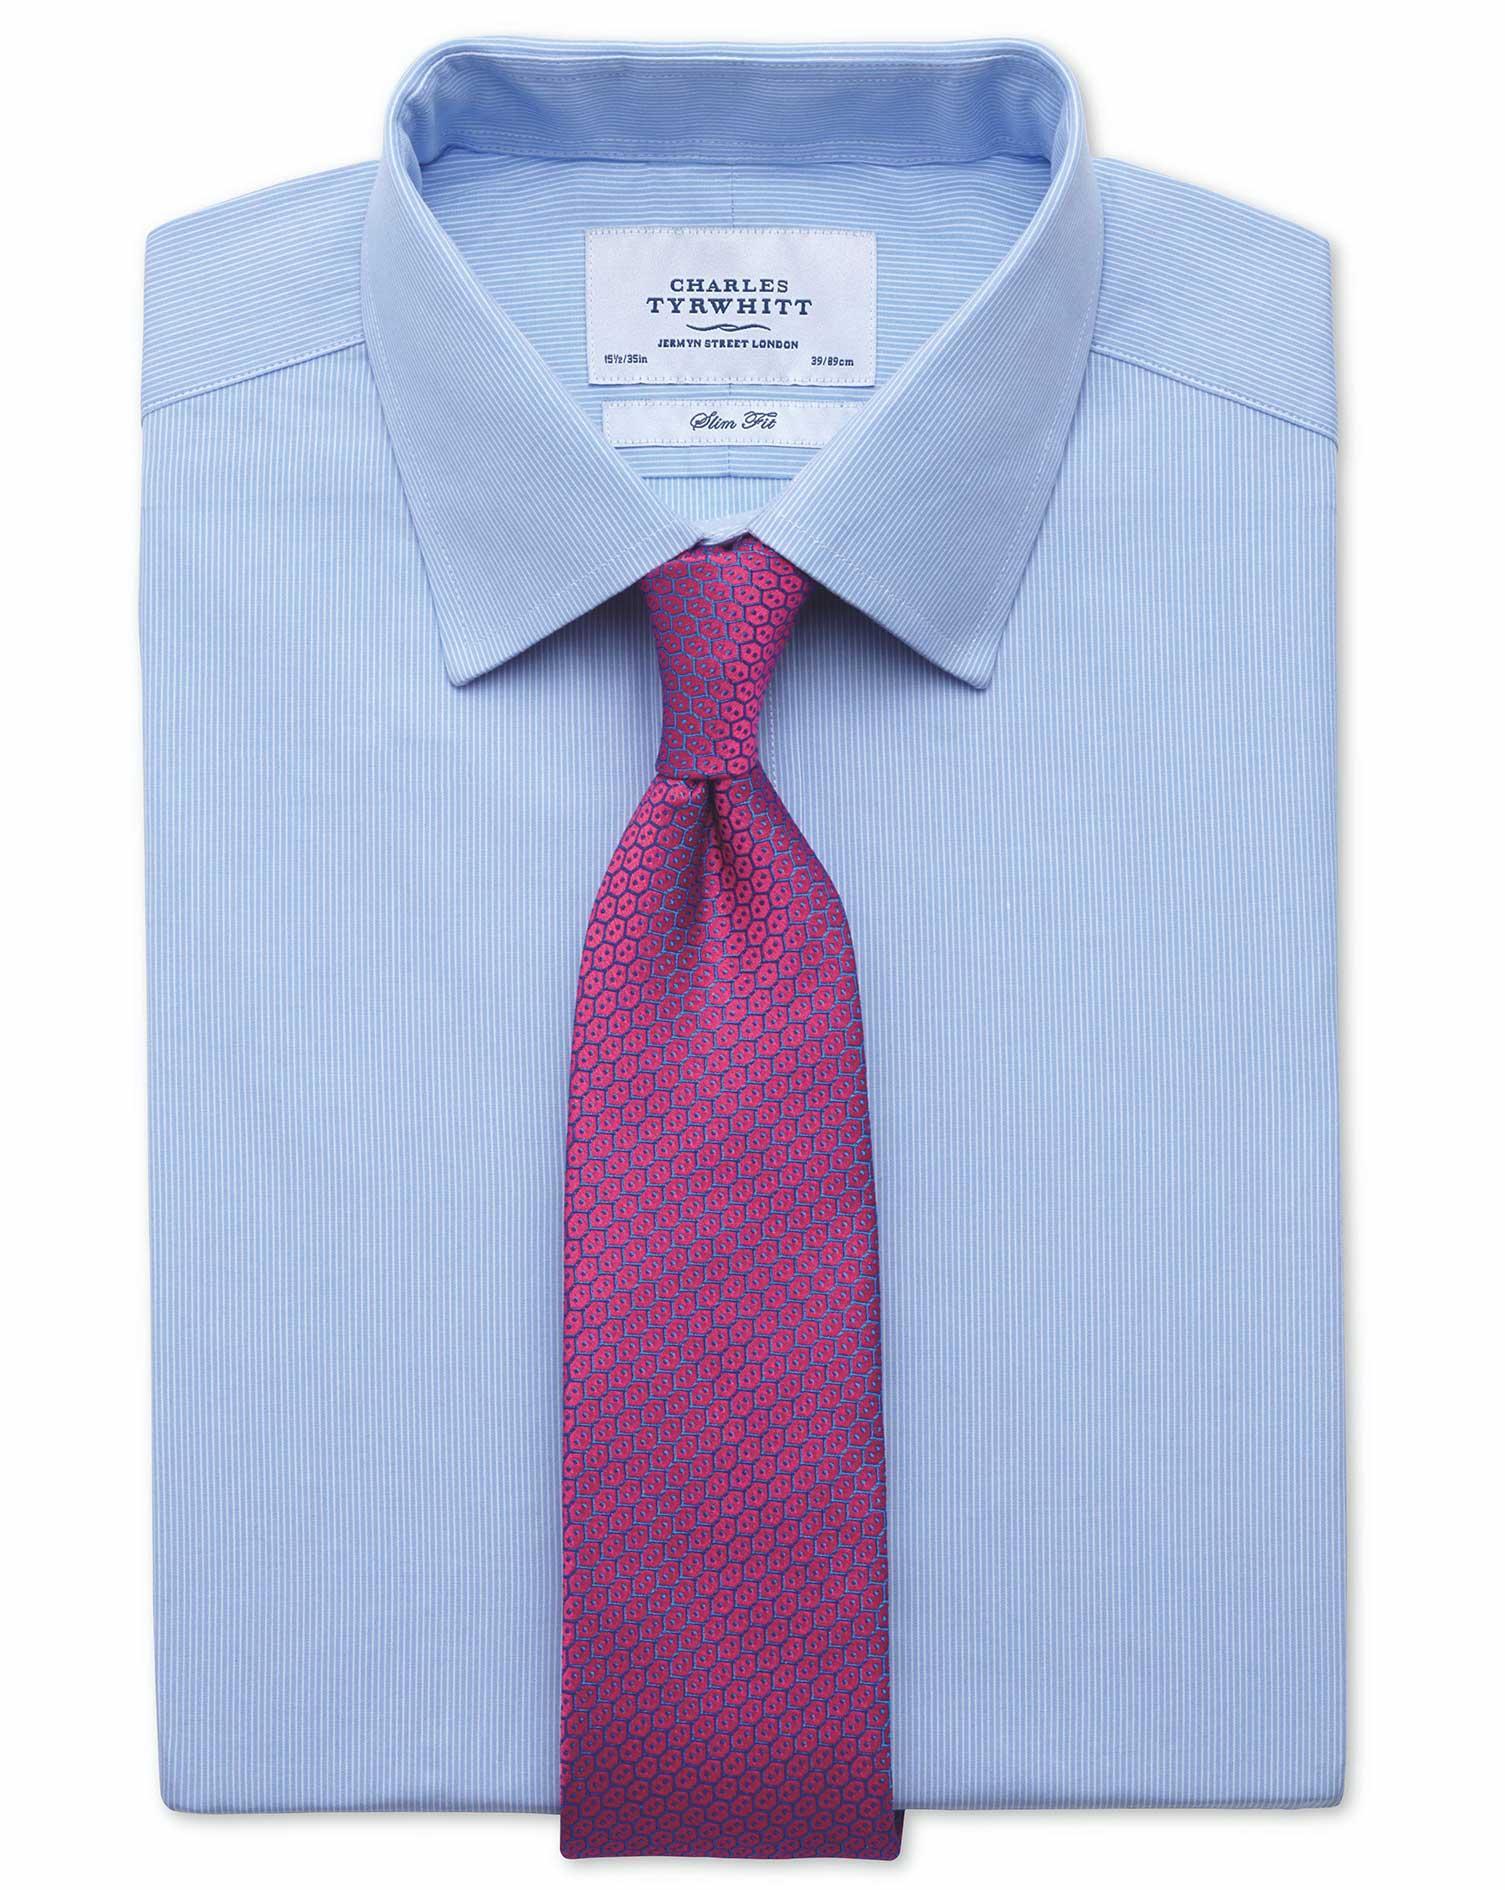 Slim Fit Fine Stripe Sky Blue Cotton Formal Shirt Double Cuff Size 15/35 by Charles Tyrwhitt